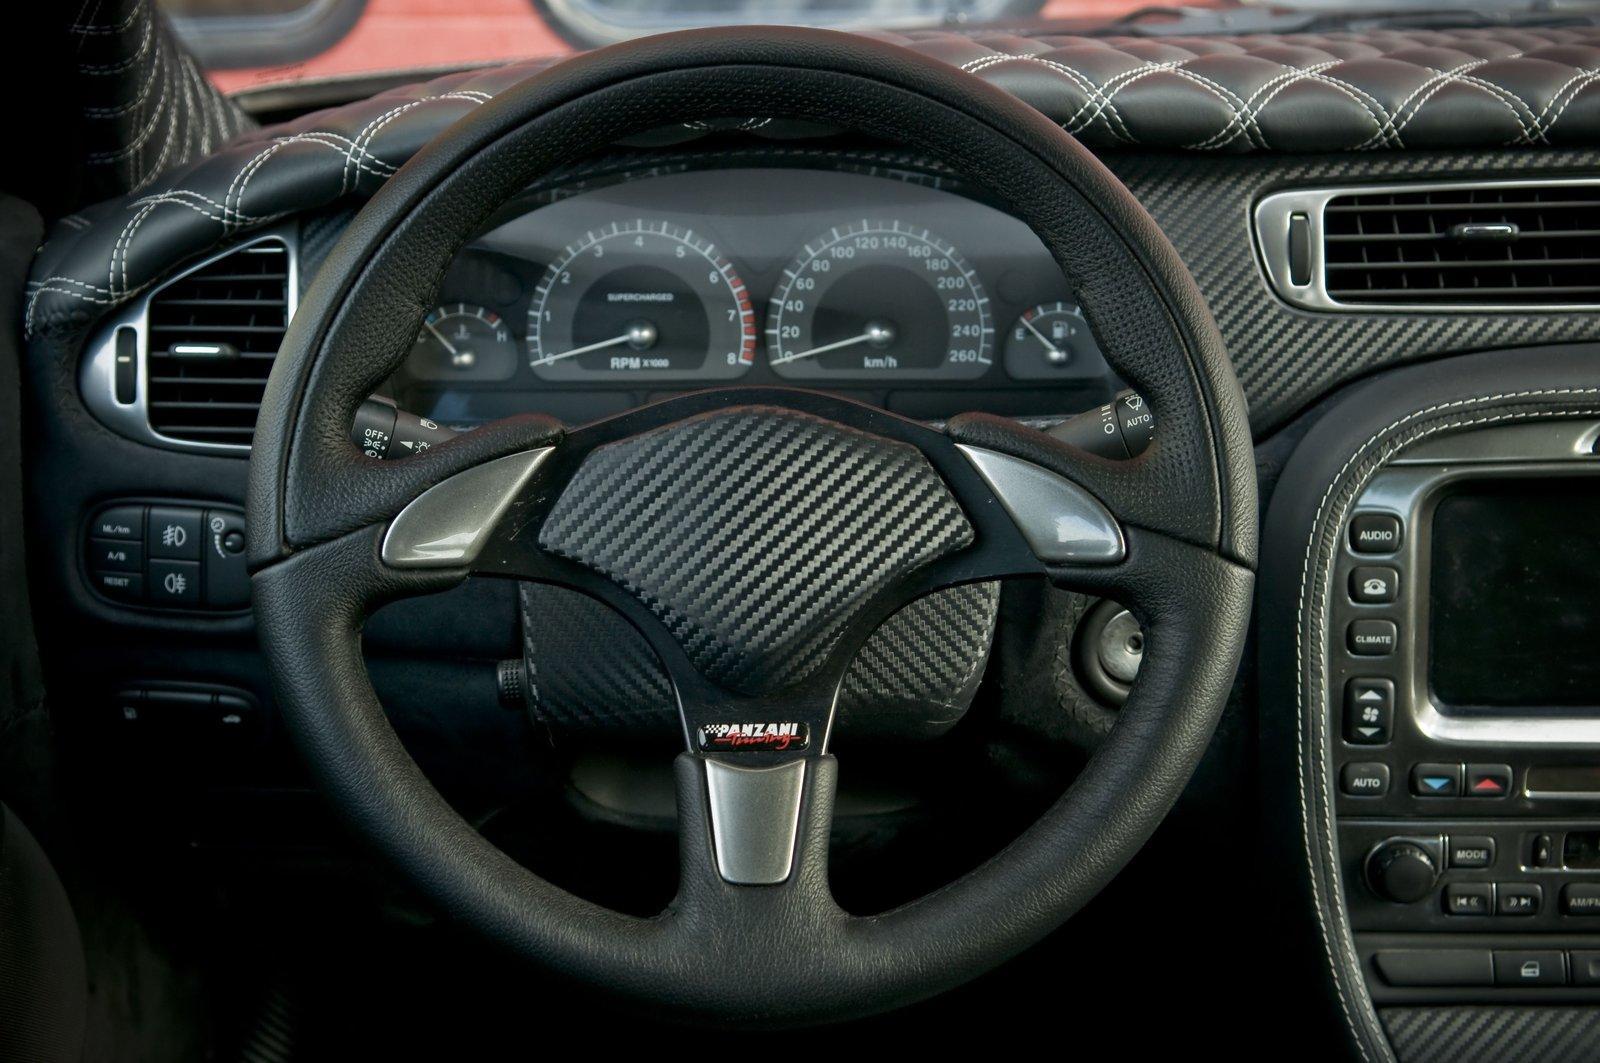 Bmw Car Pictures Wallpapers Panzani Design Jaguar X Type R Supercharged Picture 50848